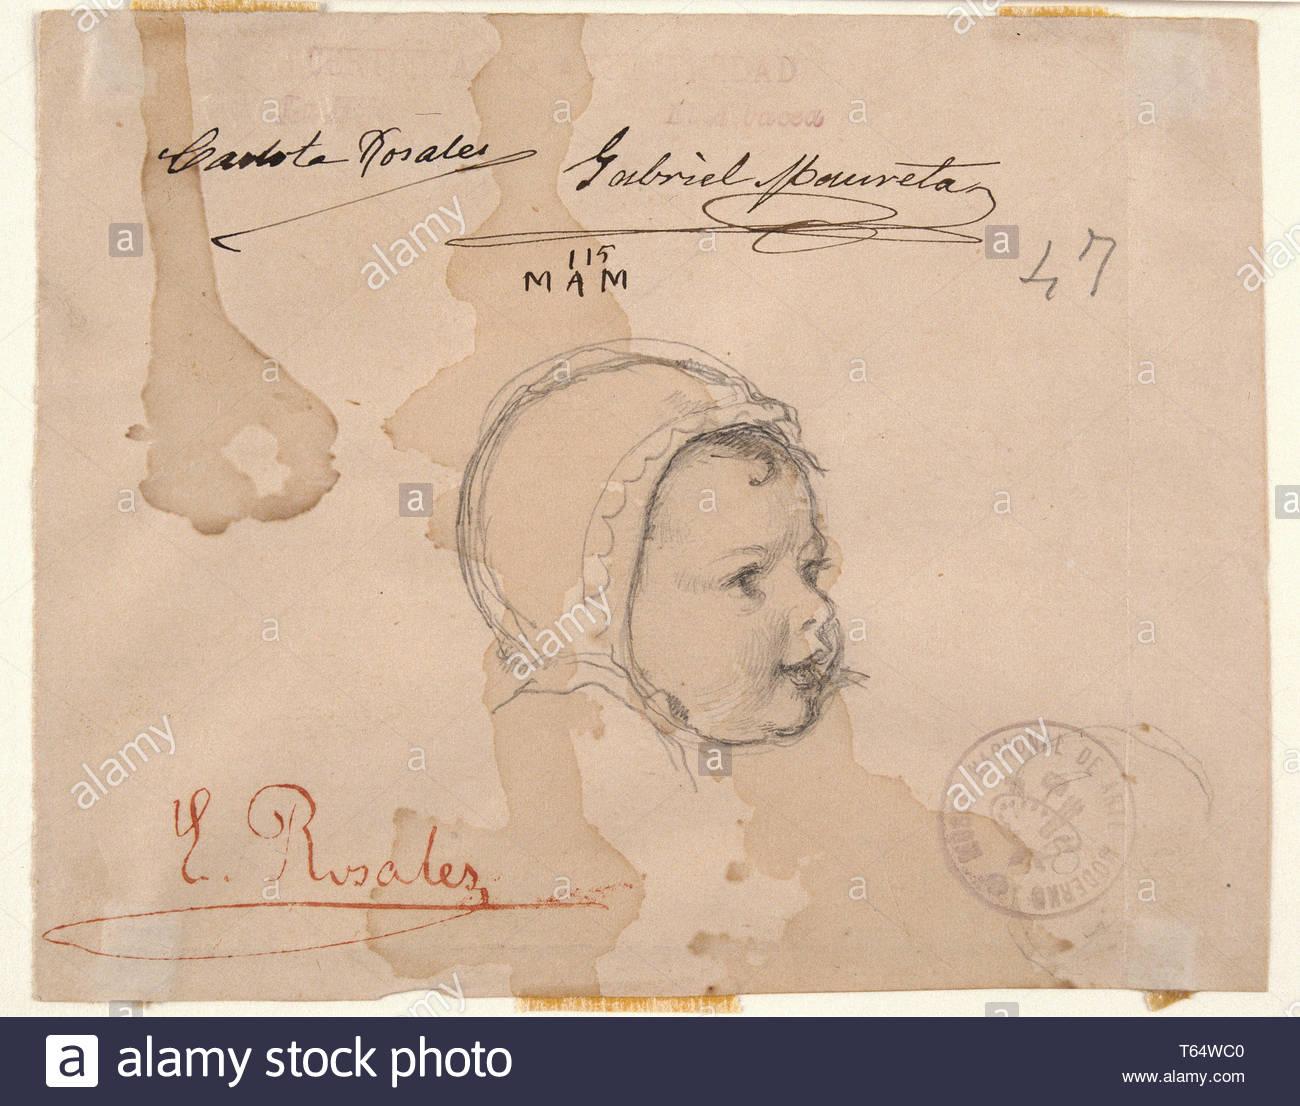 Rosales, Eduardo-Eloisa Gallinas, hija del artista2 Imagen De Stock